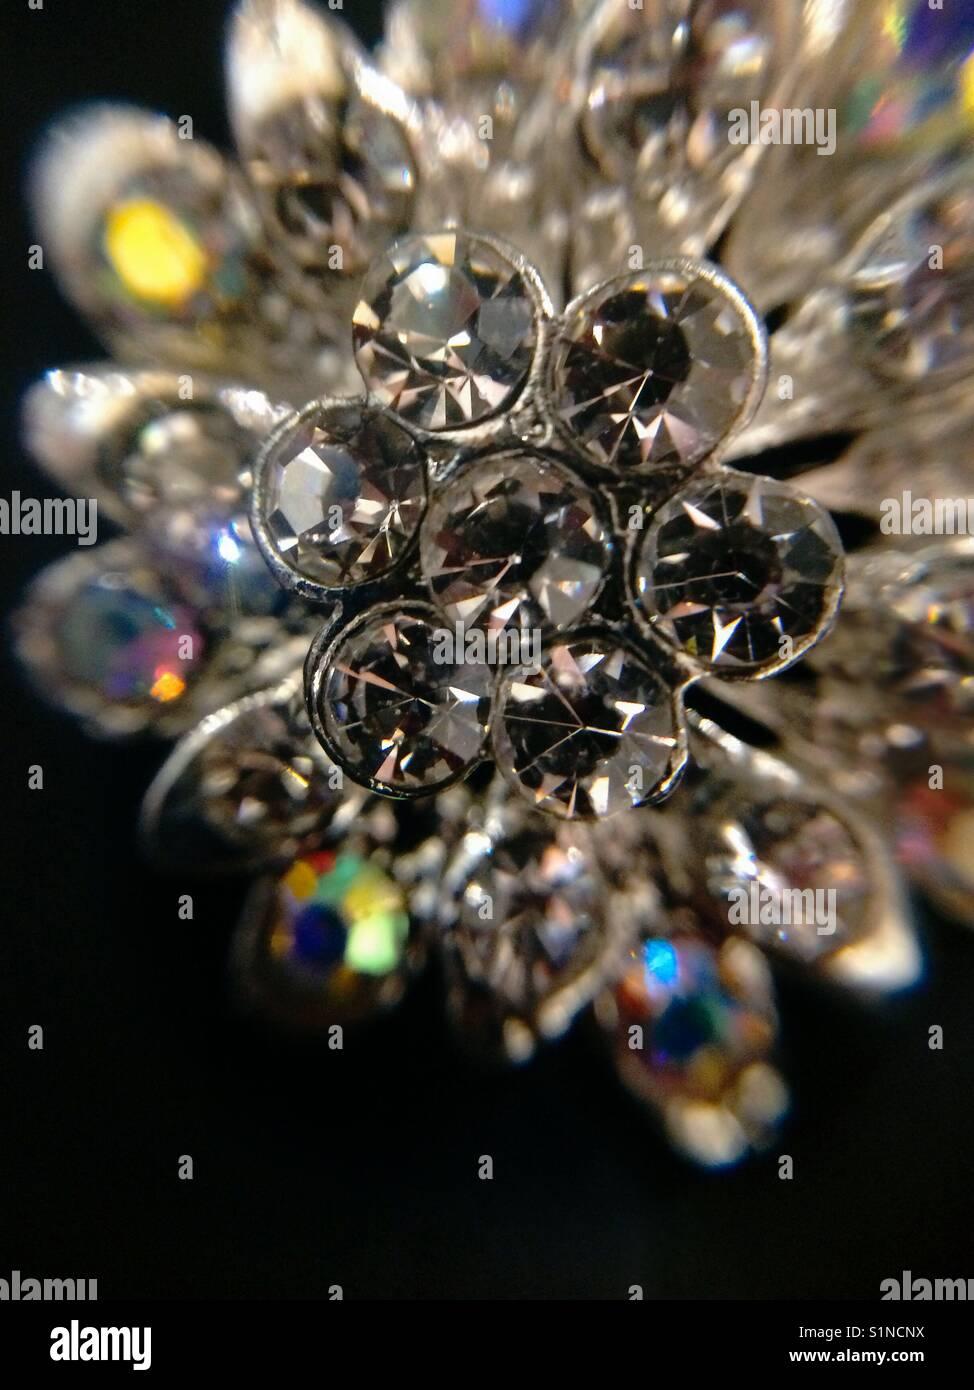 Shimmering Diamonds - Stock Image